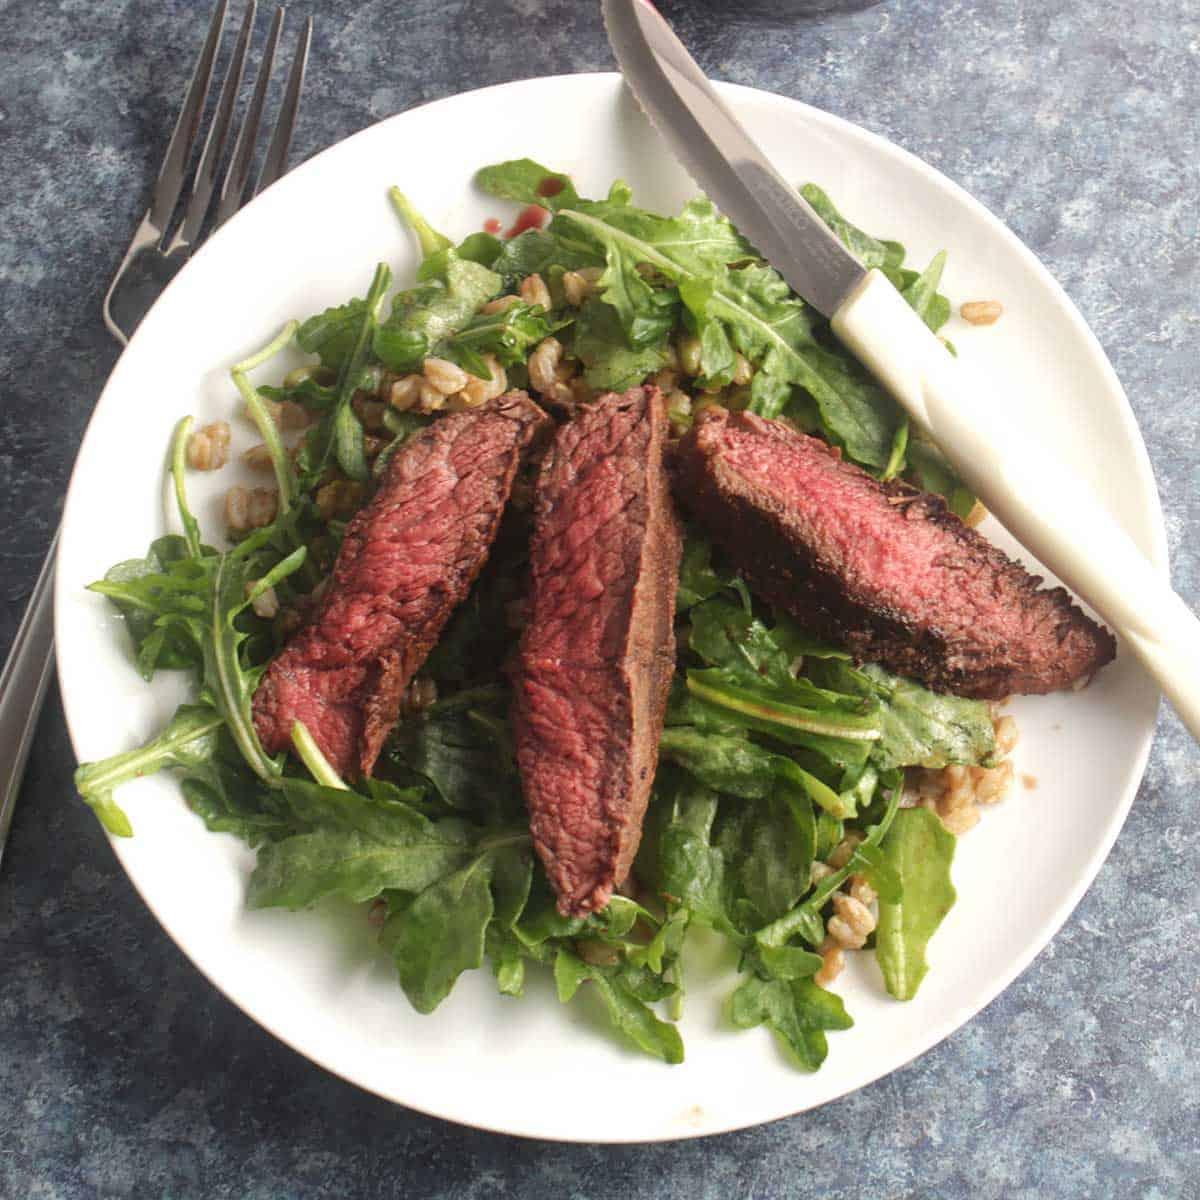 Arugula salad with steak